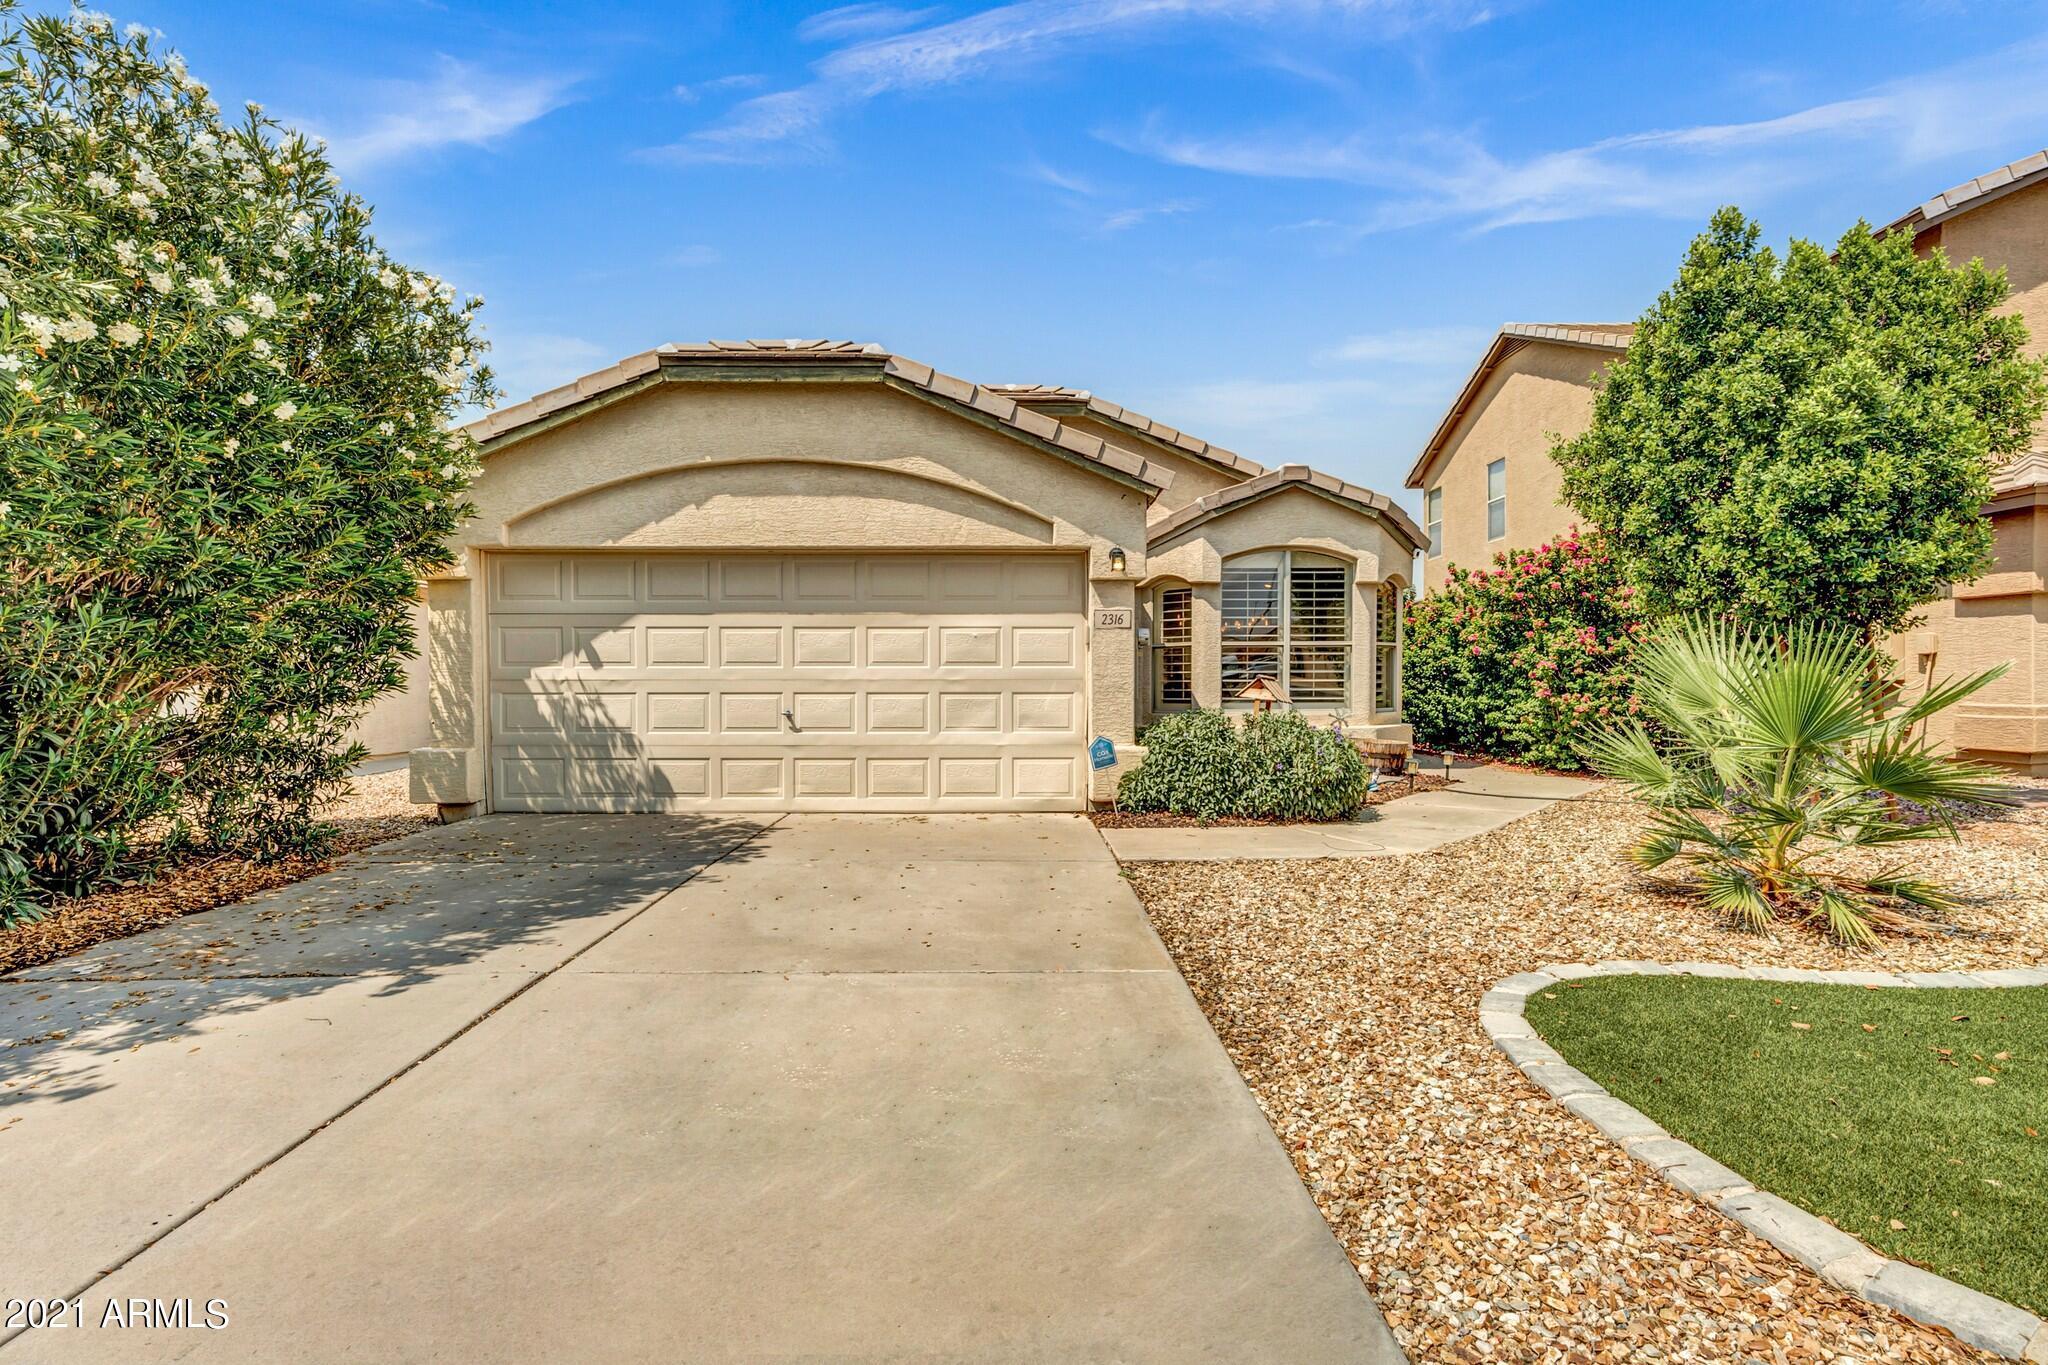 2316 PINTO Drive, Gilbert, Arizona 85296, 3 Bedrooms Bedrooms, ,2 BathroomsBathrooms,Residential,For Sale,PINTO,6277810